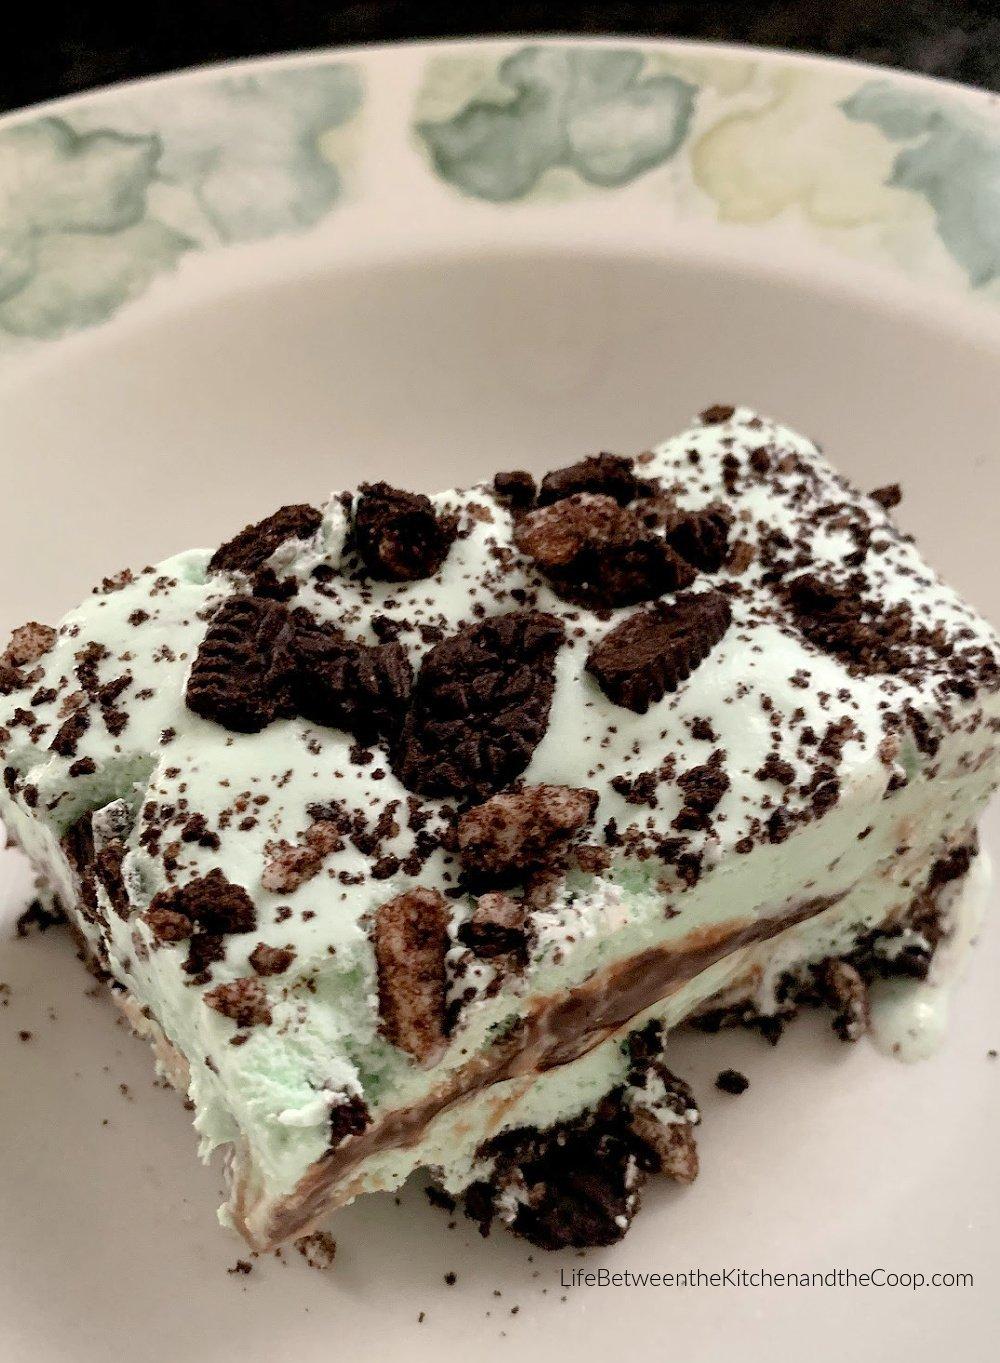 grasshopper dessert with oreo crust and hot fudge